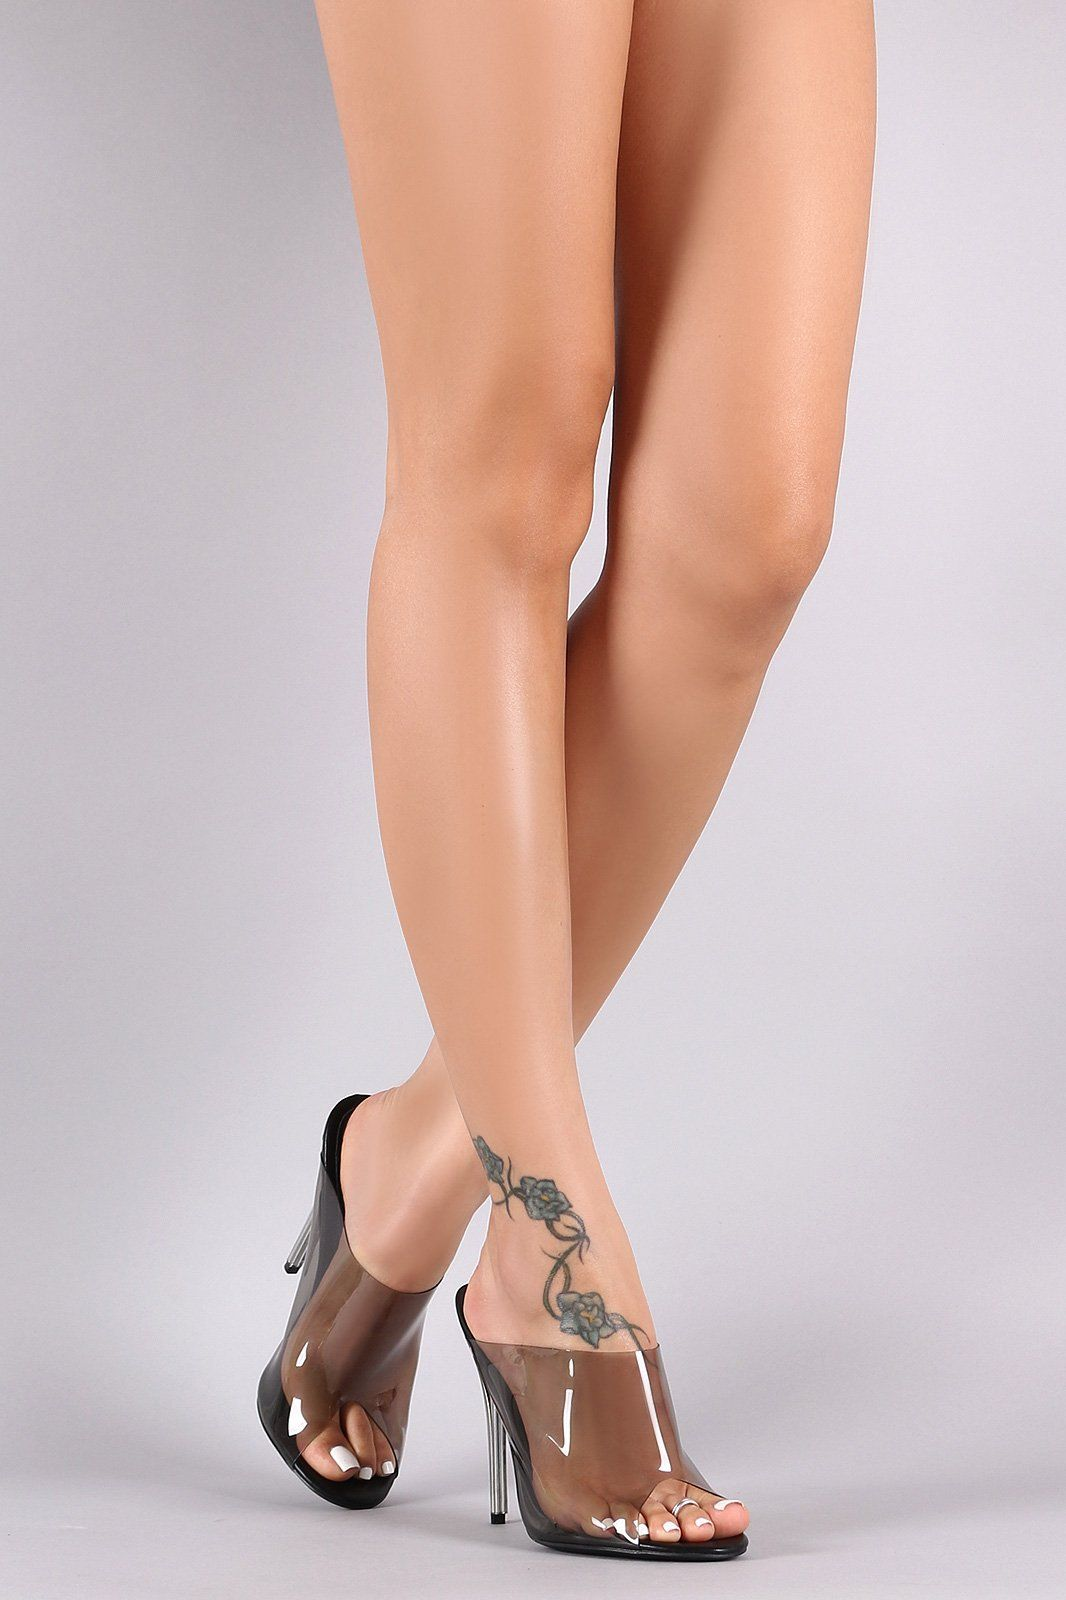 Transparent Peep Toe Mule Stiletto Heel in 2019